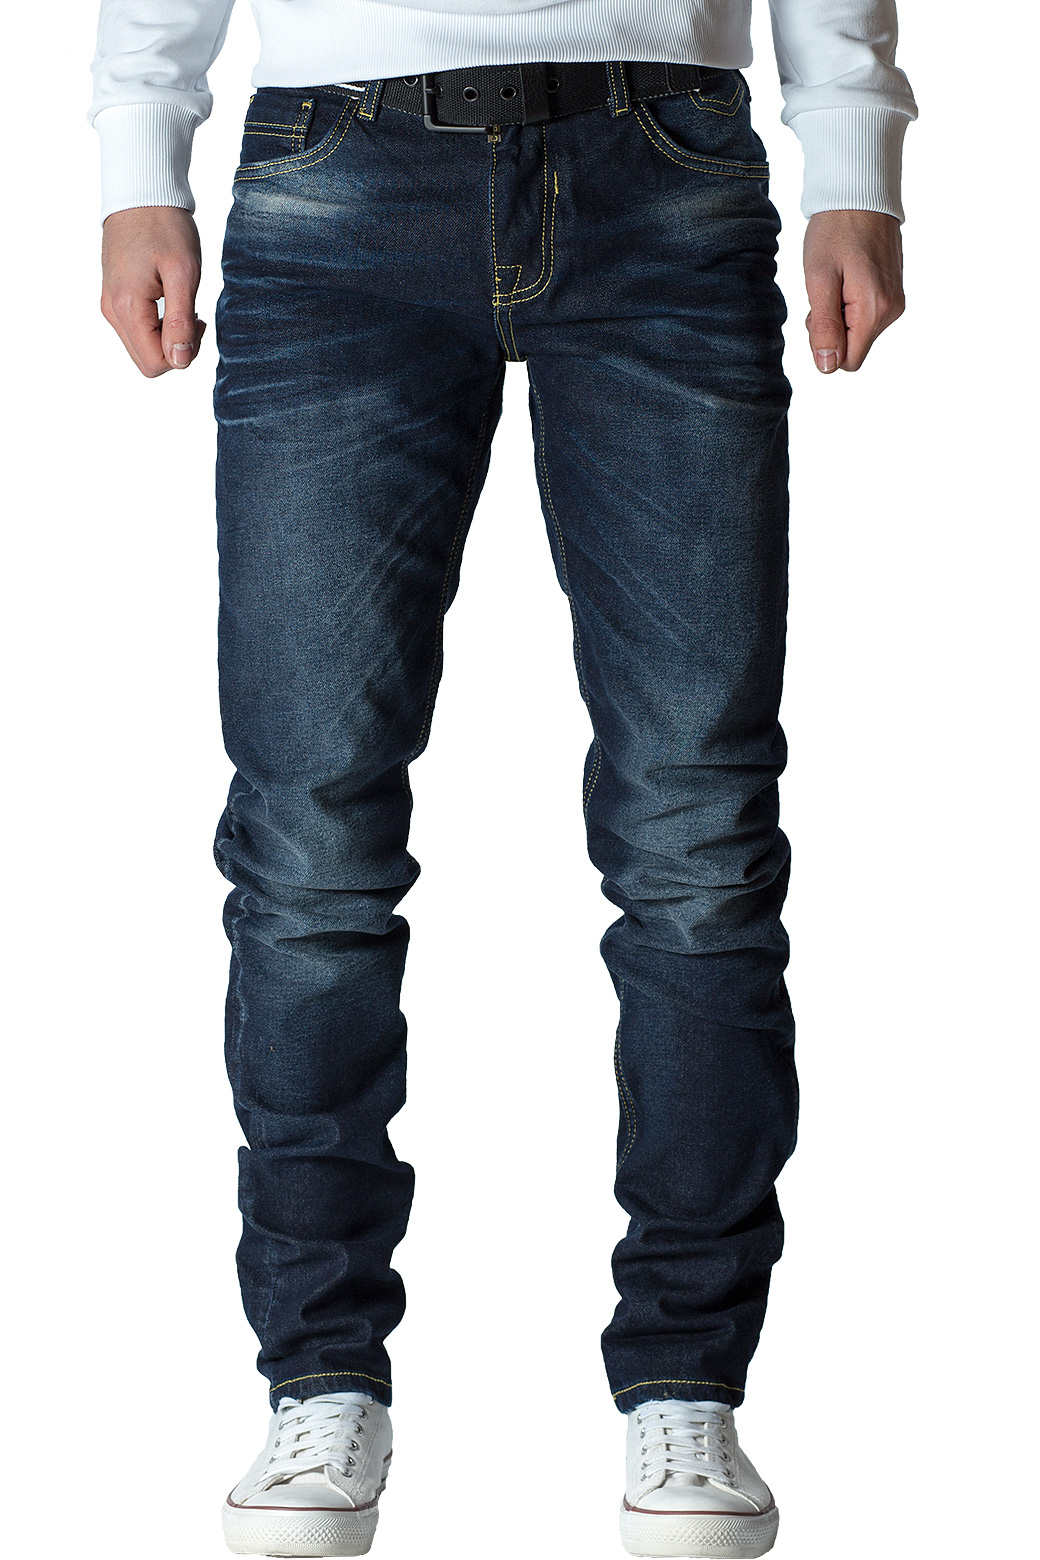 Cipo-amp-Baxx-Uomo-Jeans-Pantaloni-ricamate-Biker-Style-streetwear-nervature-pattern-Dope miniatura 29